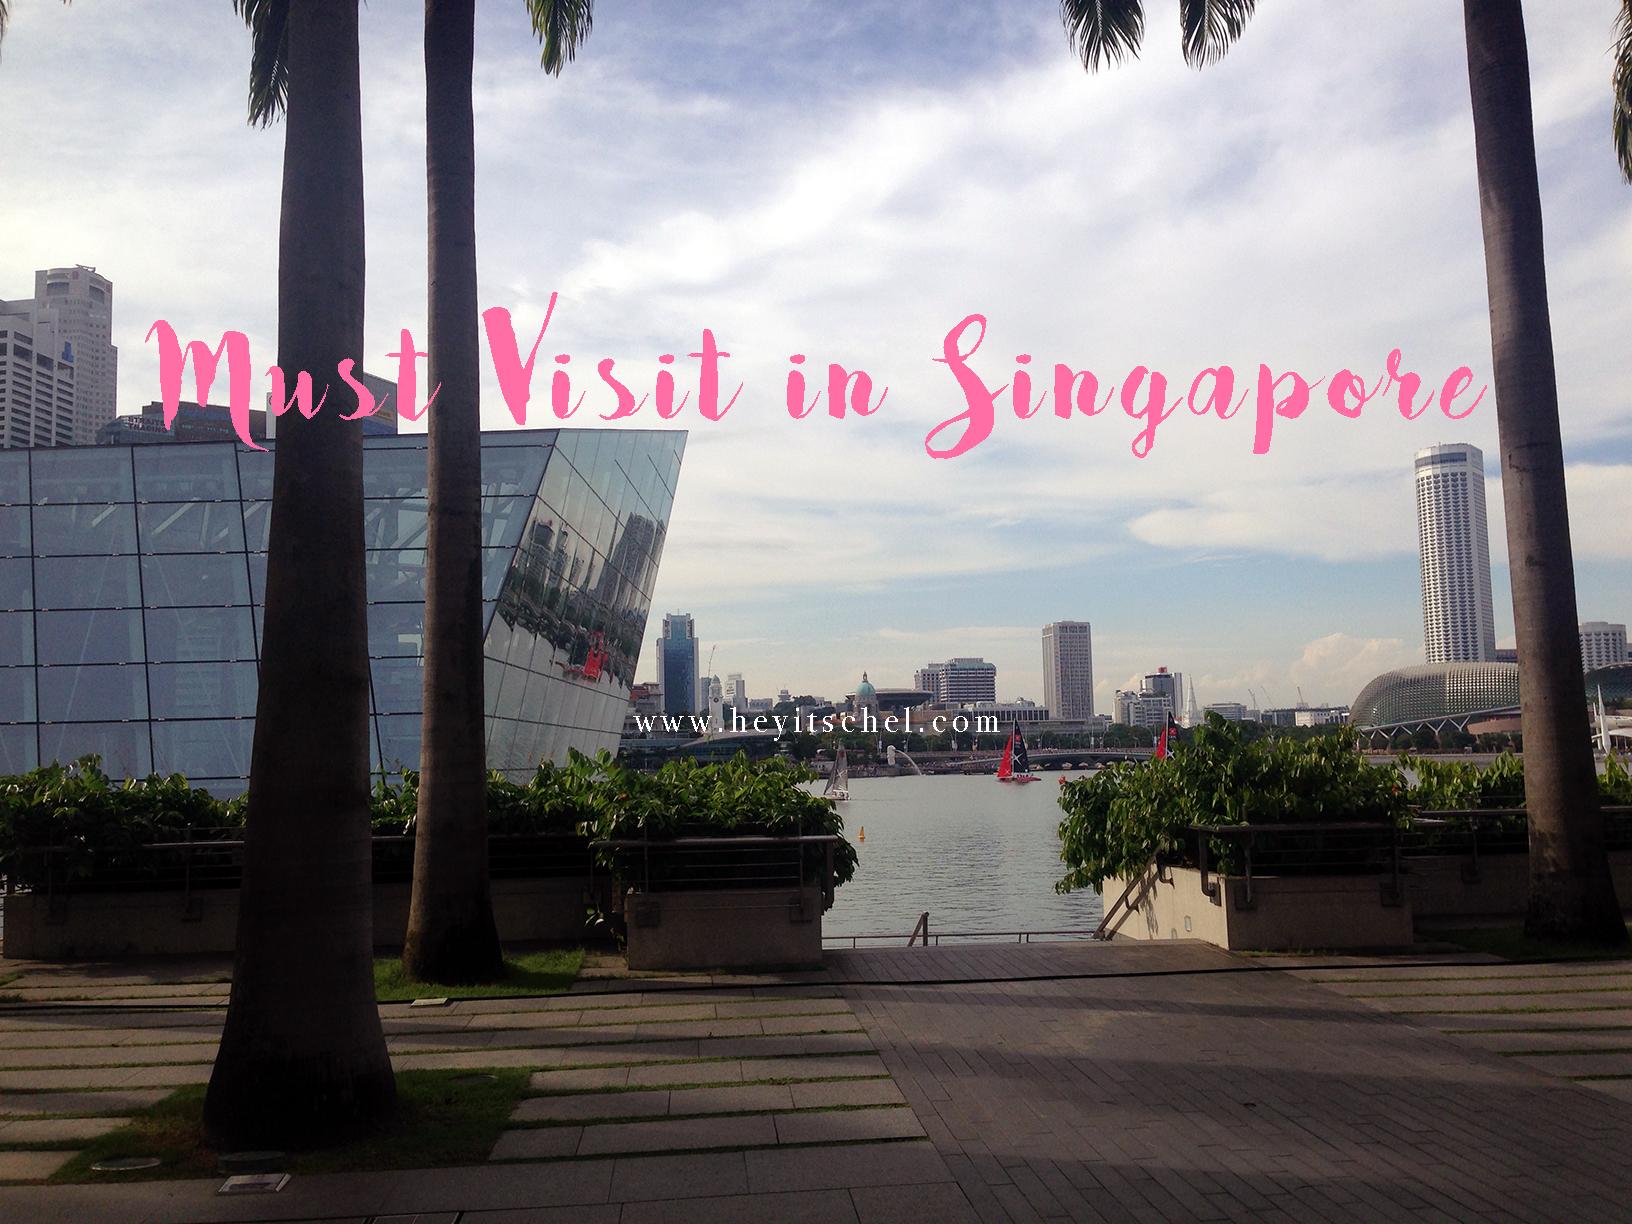 Must Visit in Singapore